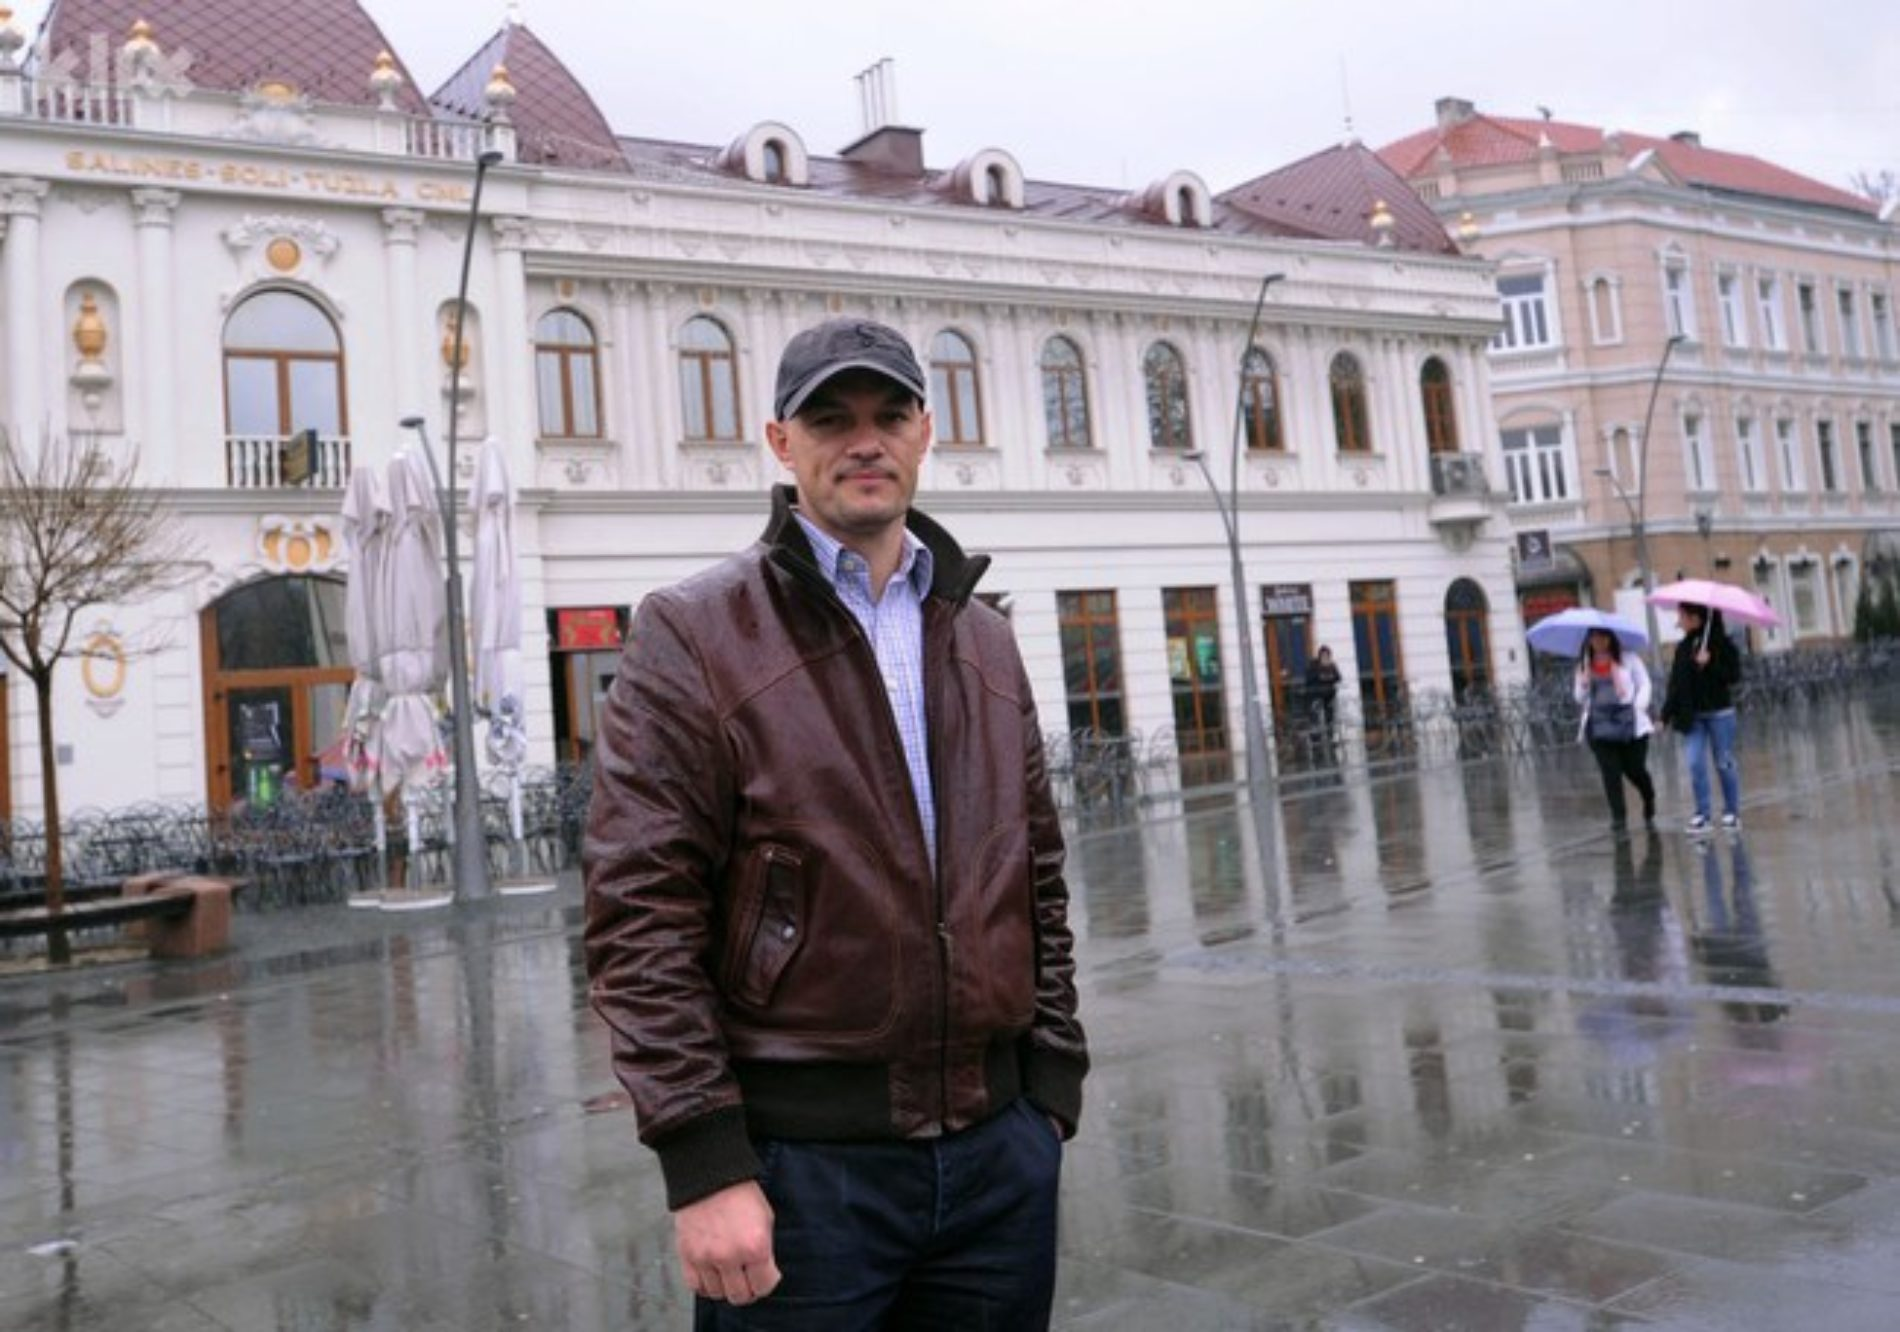 Priča o herojstvu: Prije 22 godine Edin Haračić Klej uništio 6 agresorskih tenkova